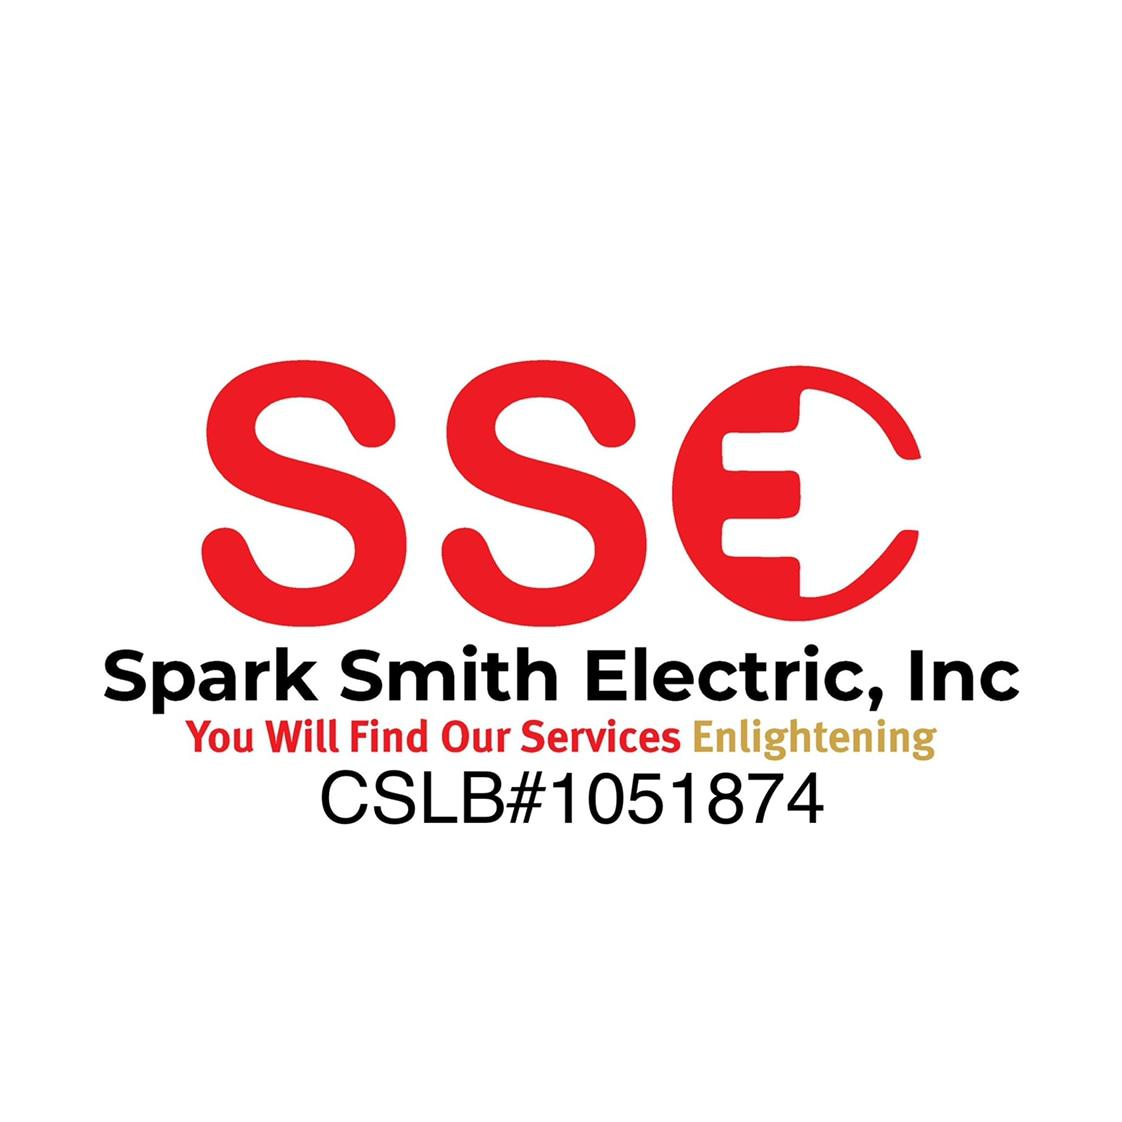 Spark Smith Electric, Inc.